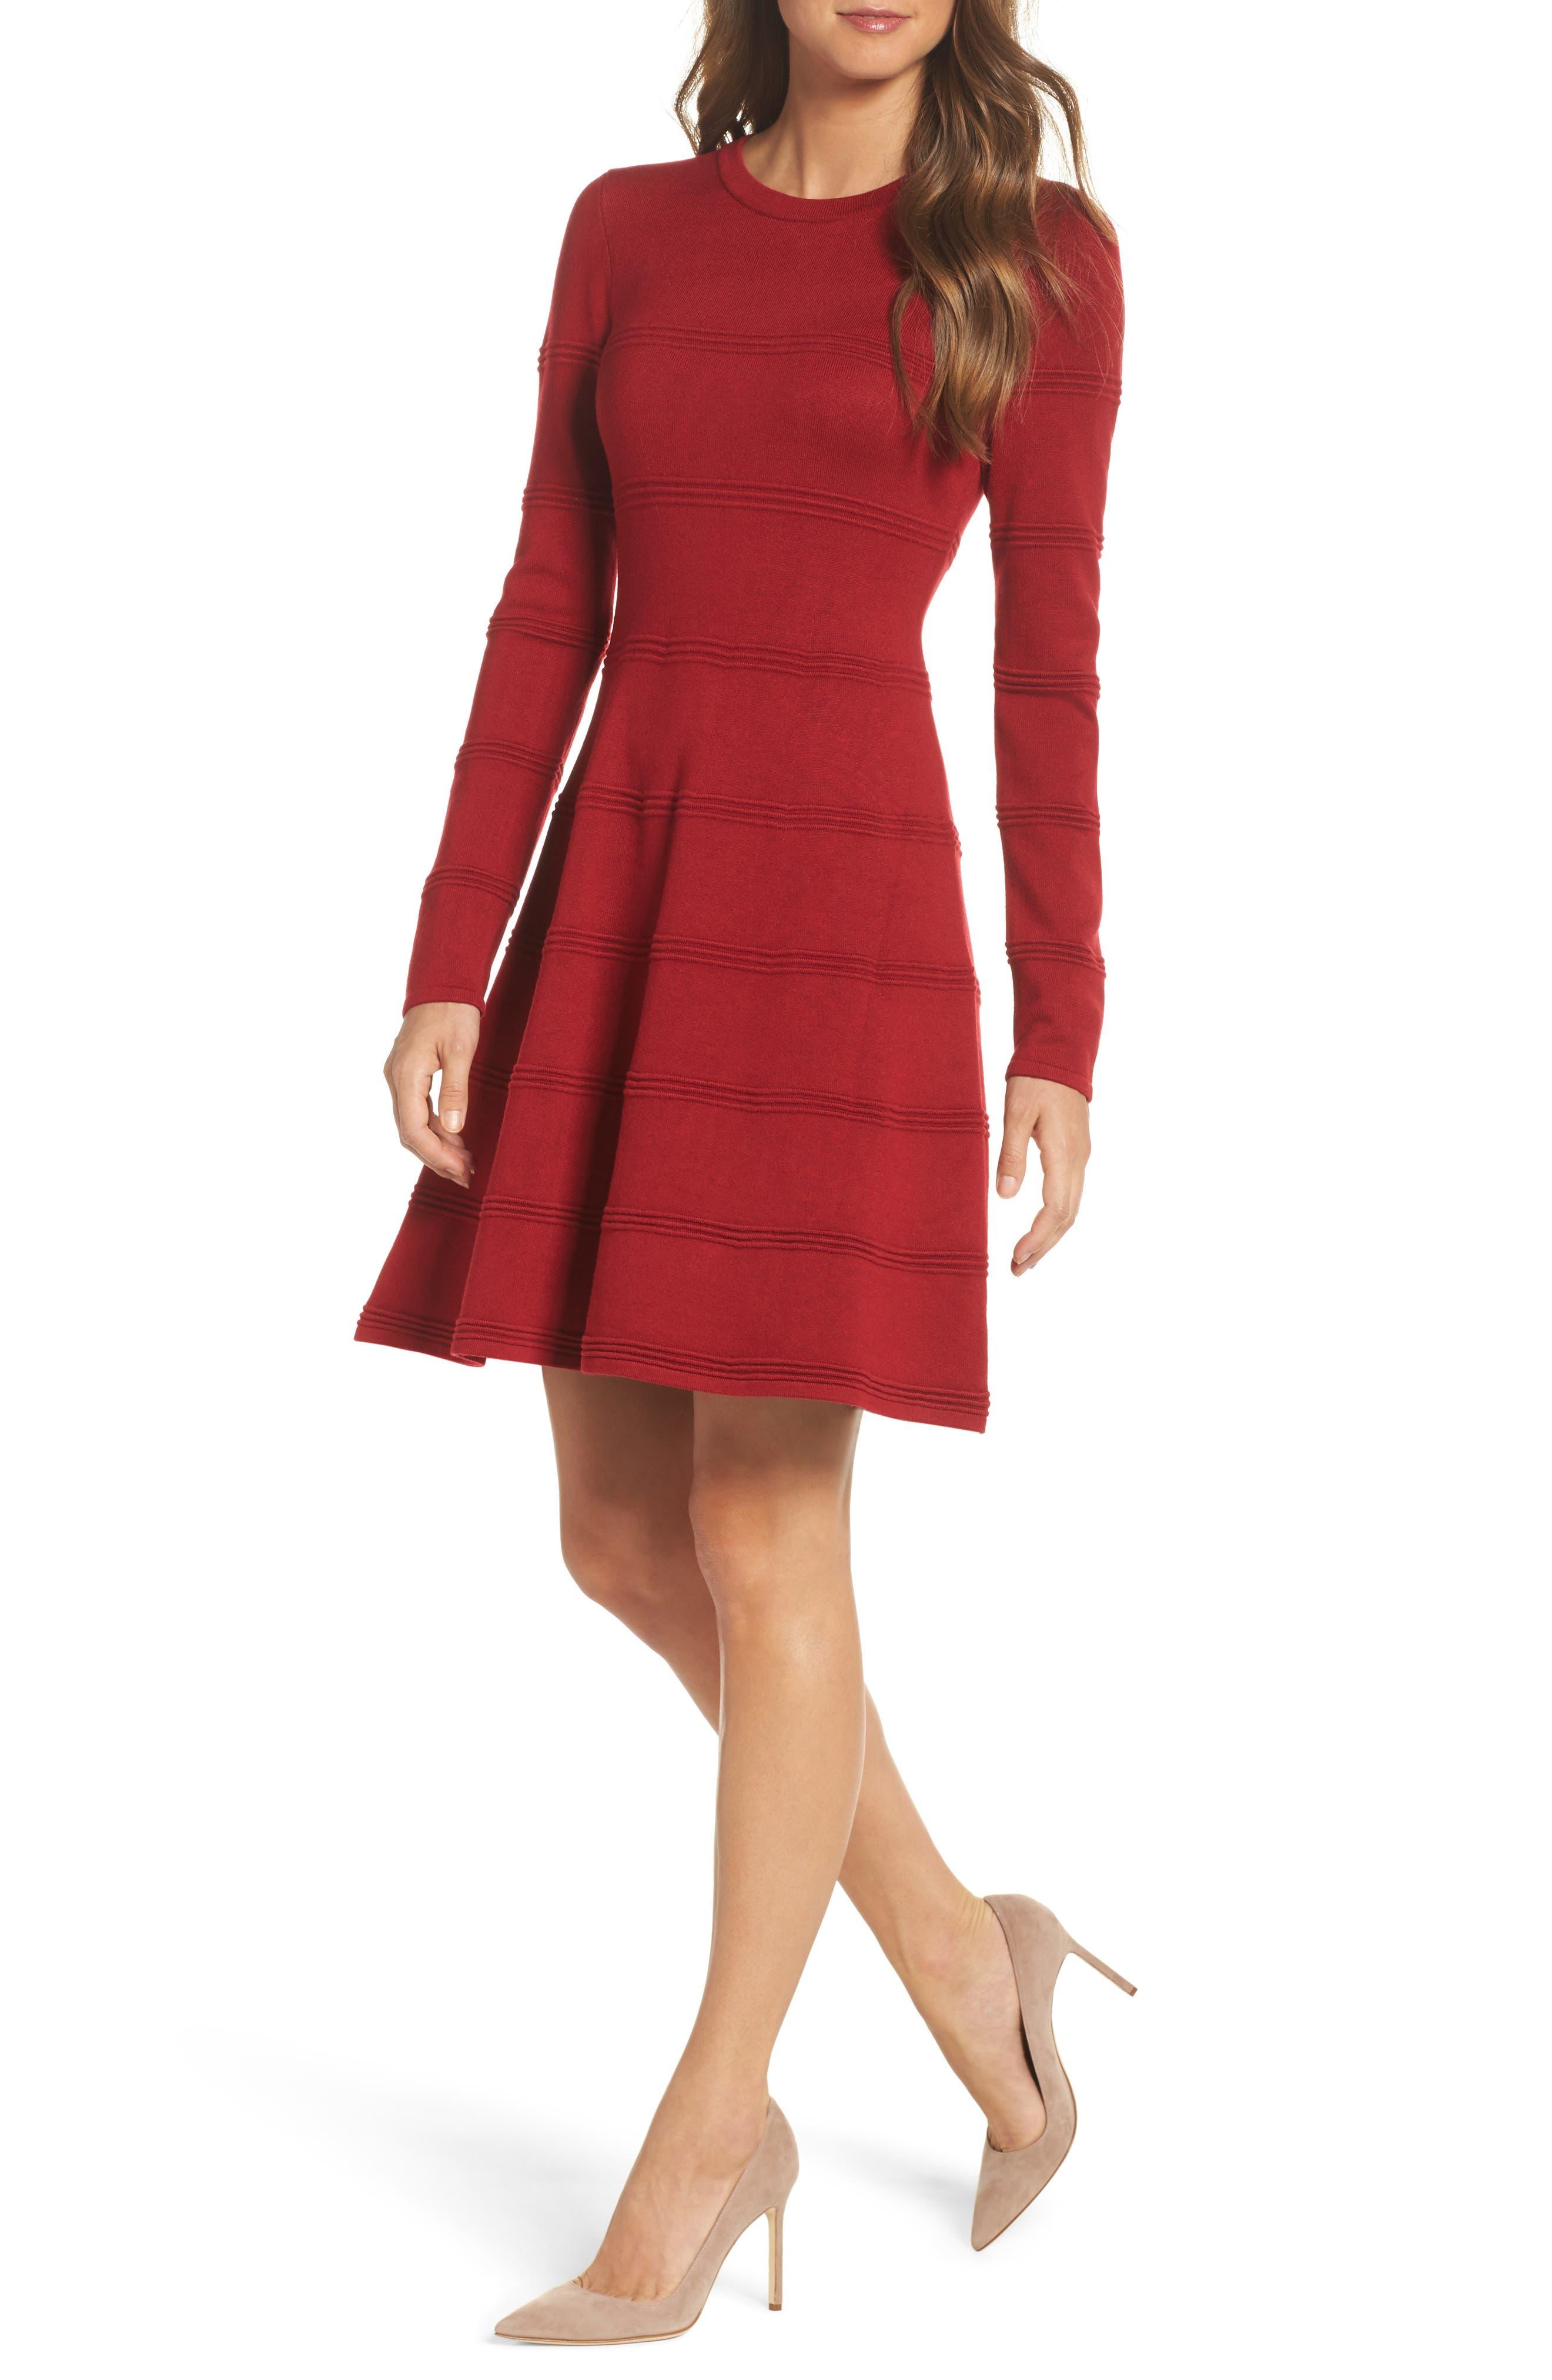 C luce red dress james